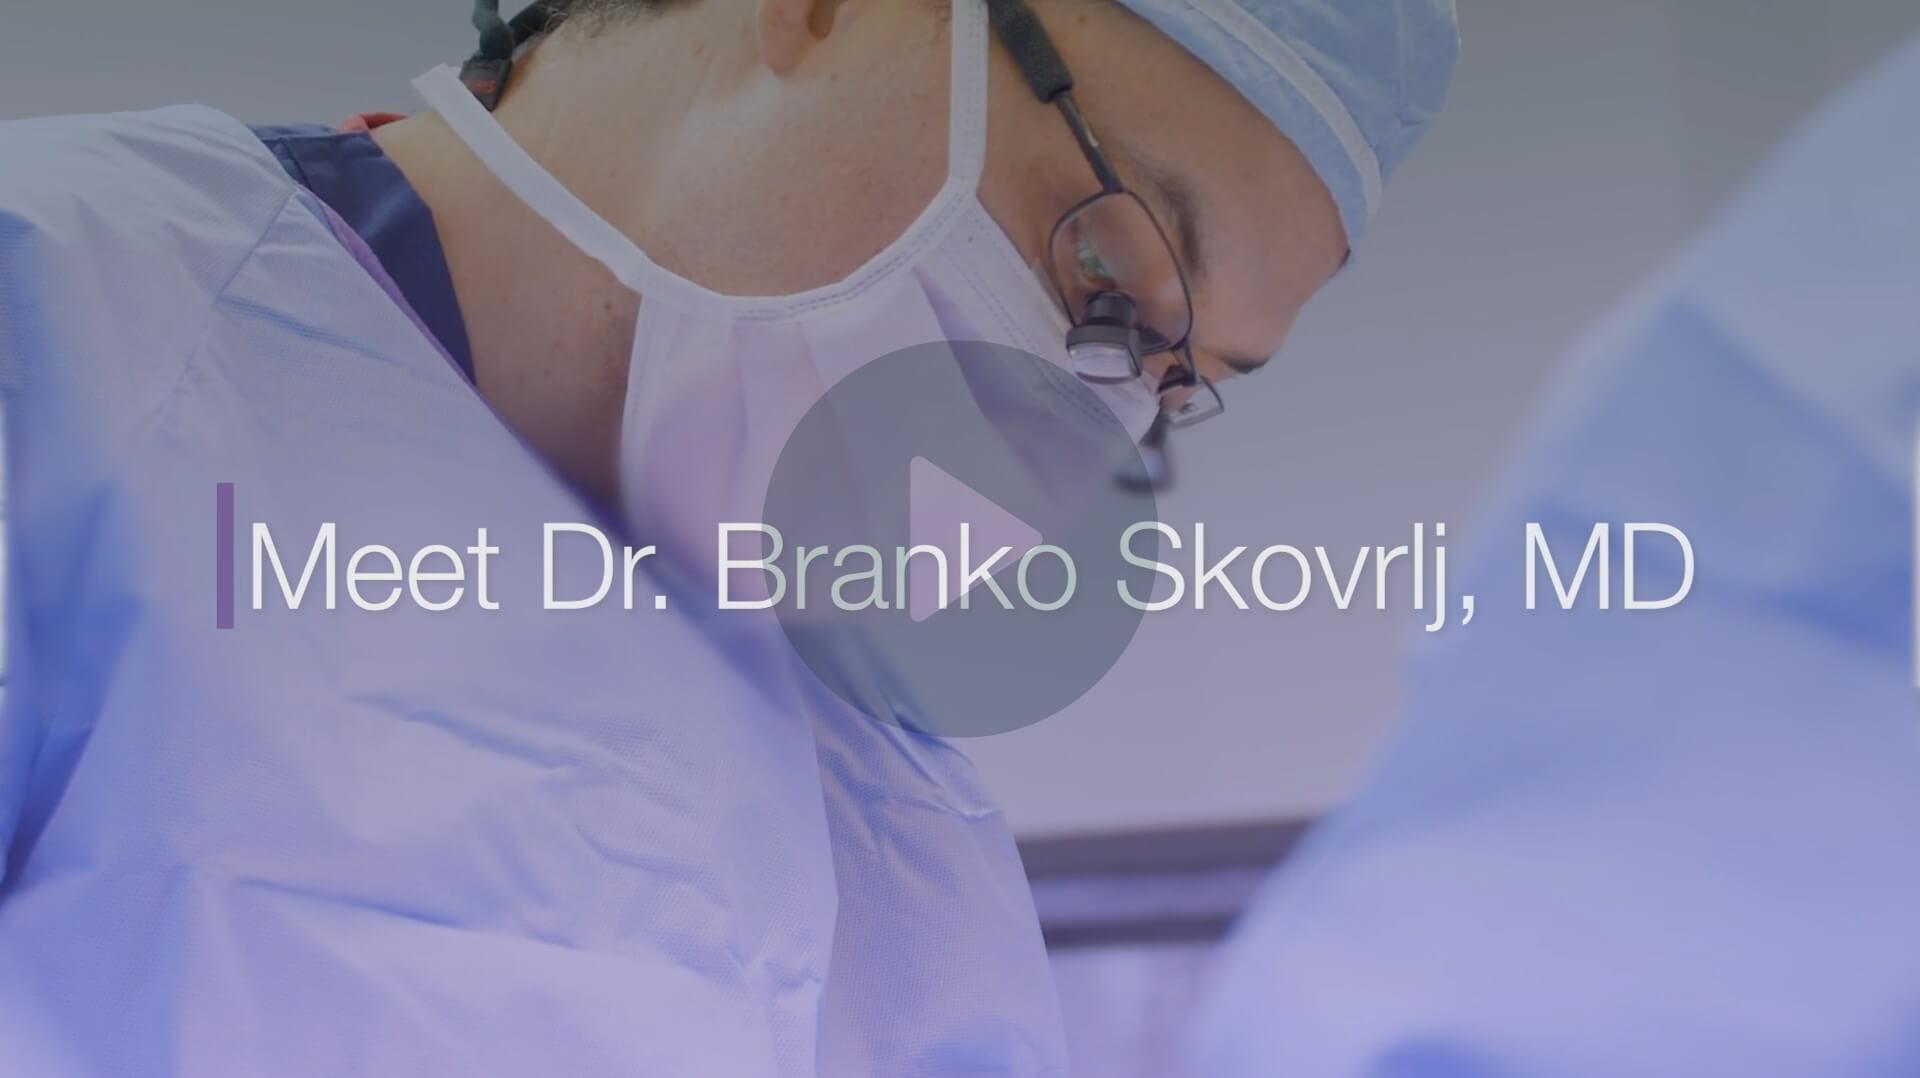 Meet Dr. Branko Skovrlj, MD